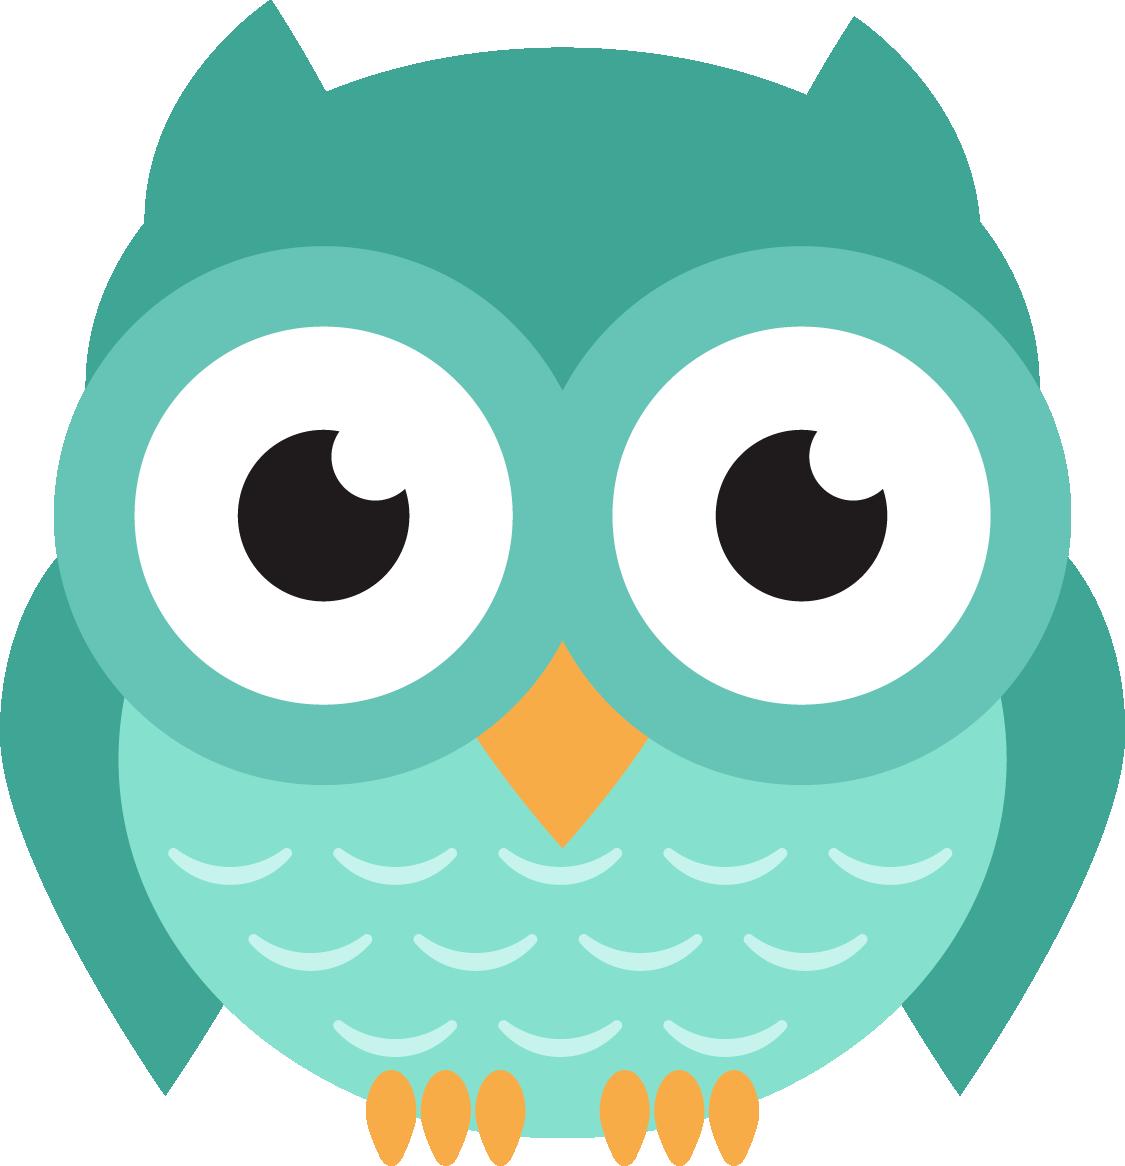 Owl iphone plus s. Owls clipart transparent background